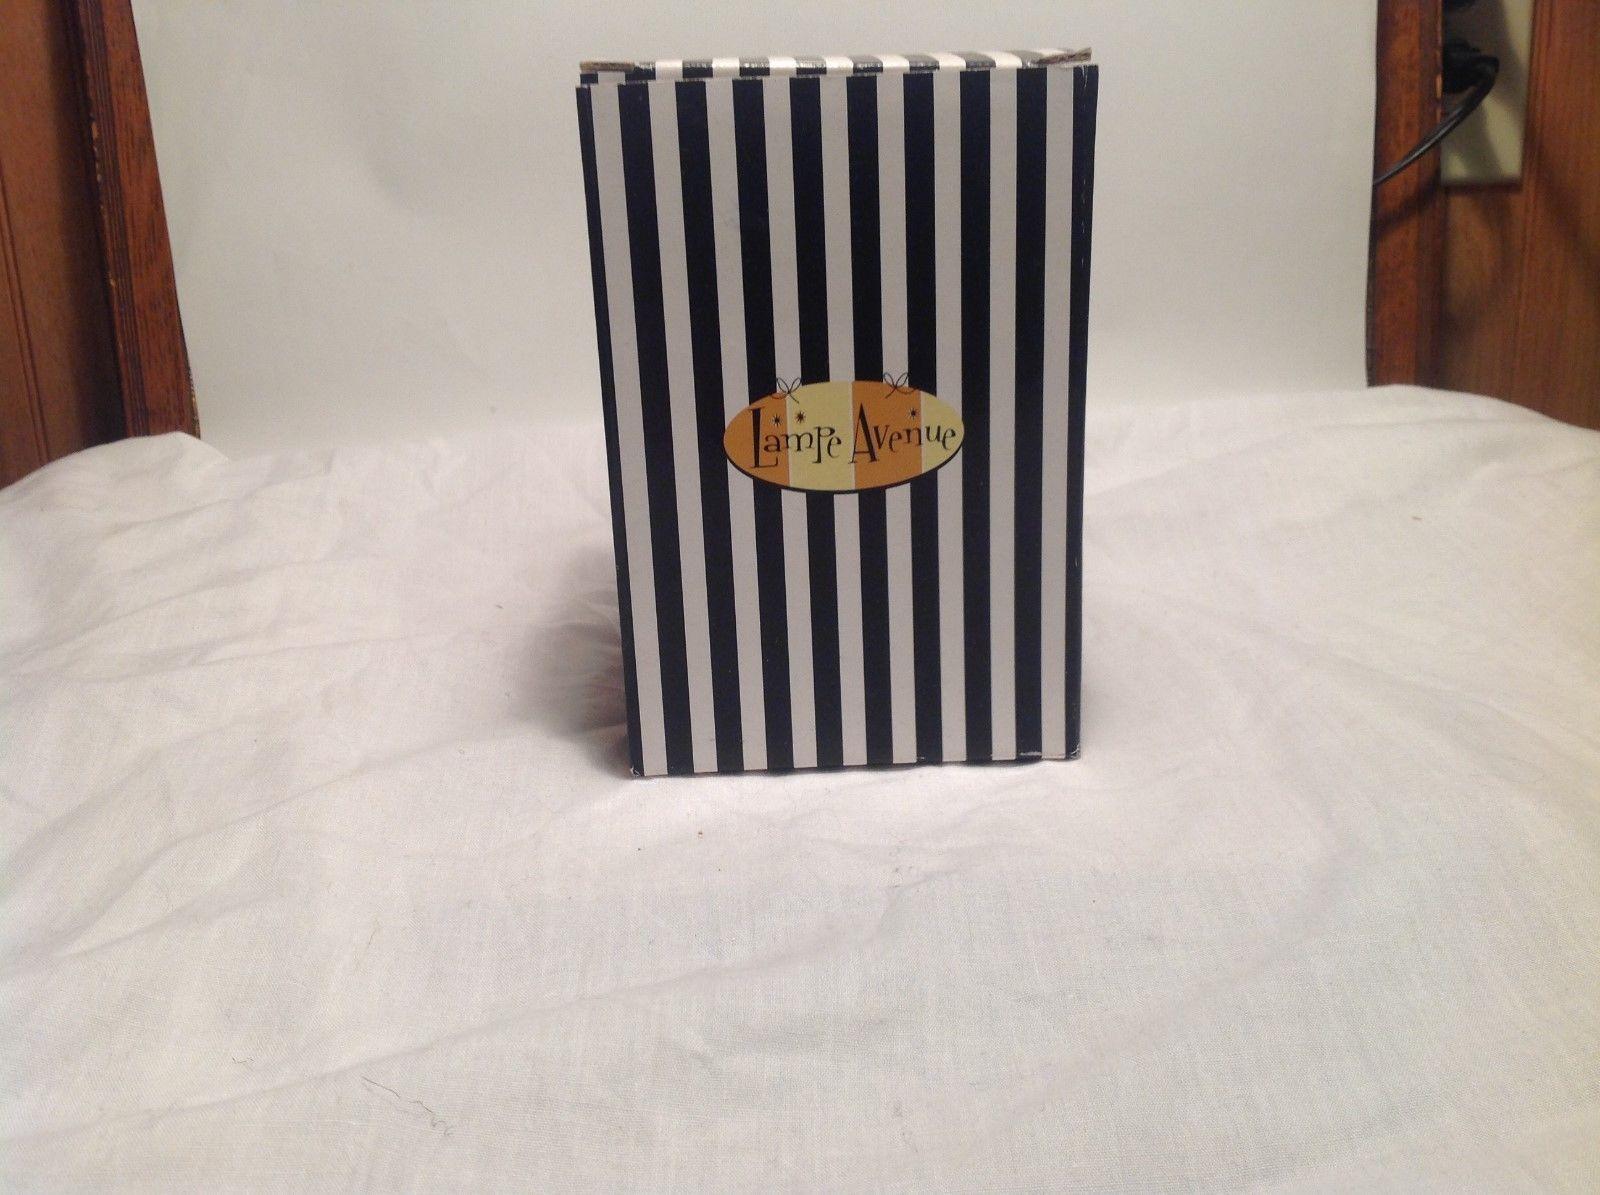 New In Box Fashion Forward Fragrance Perfume Bottle